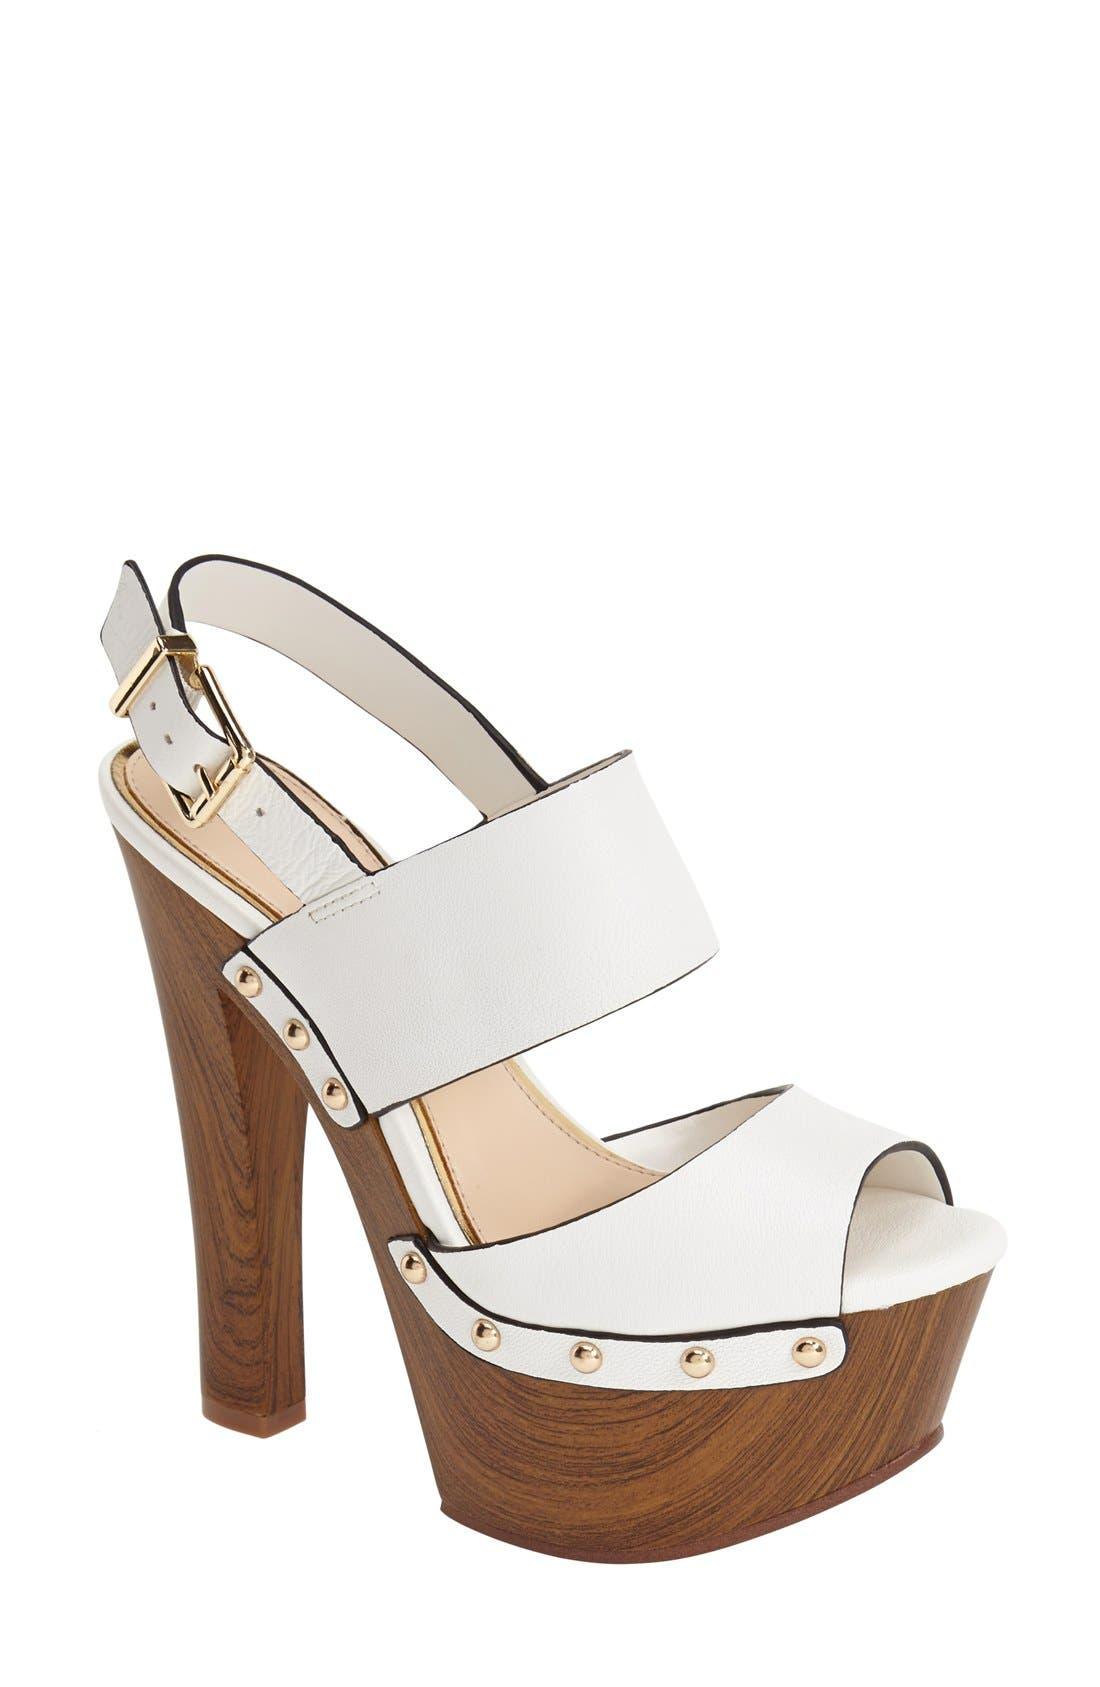 Alternate Image 1 Selected - Jessica Simpson 'Dallis' Platform Sandal (Women)